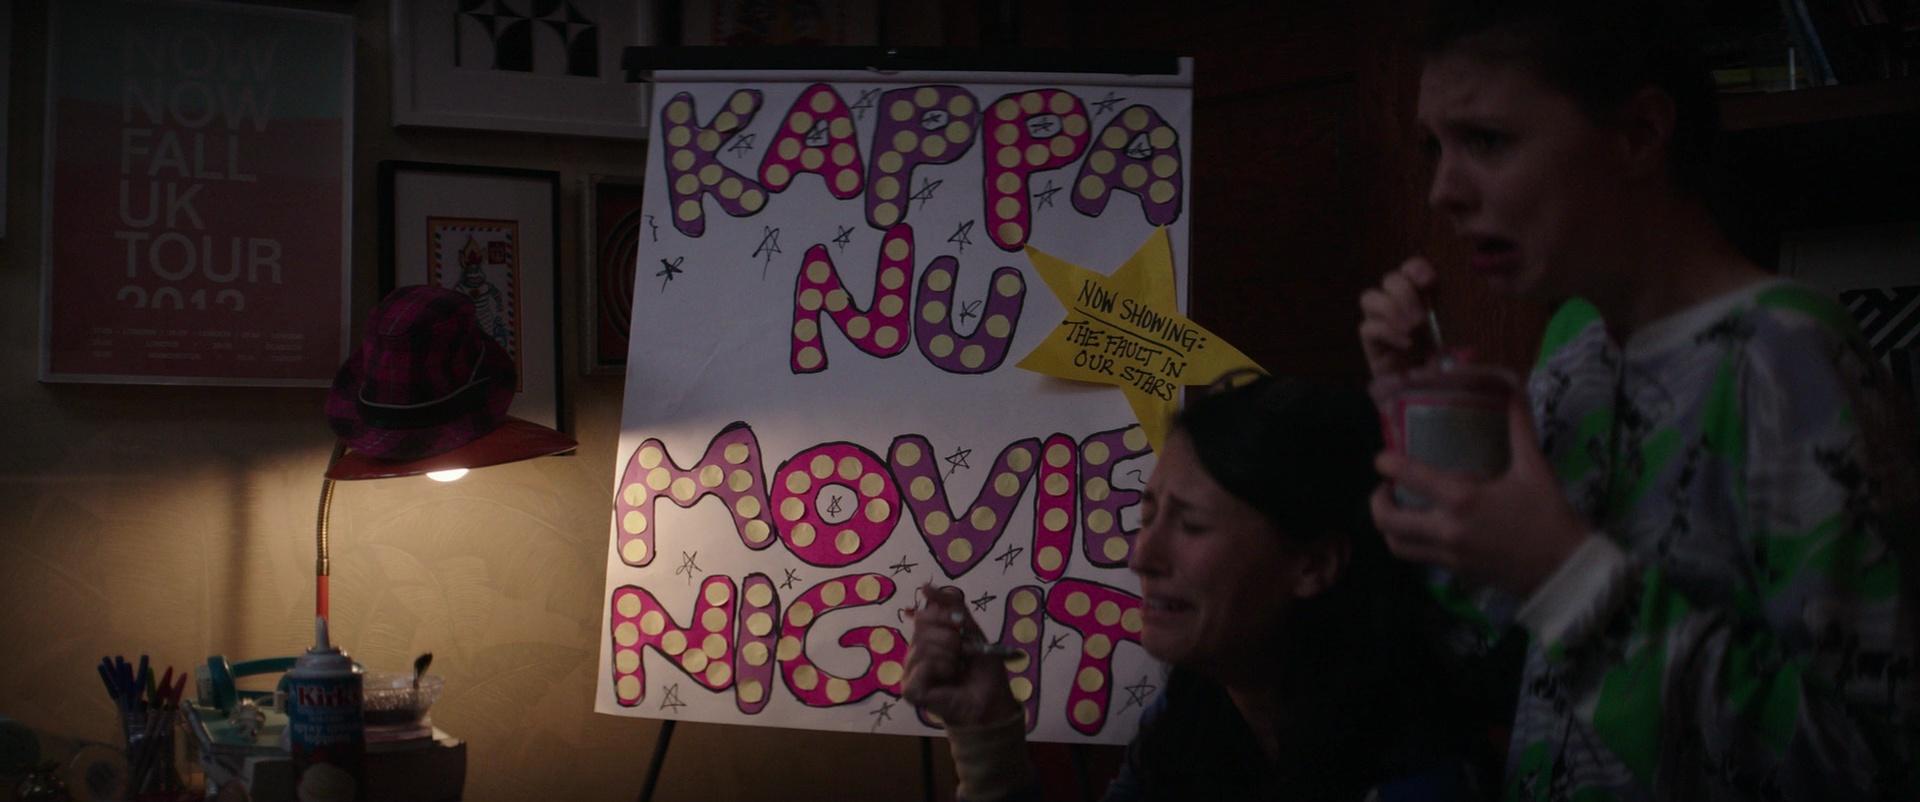 Neighbors 2: Sorority Rising film still 1